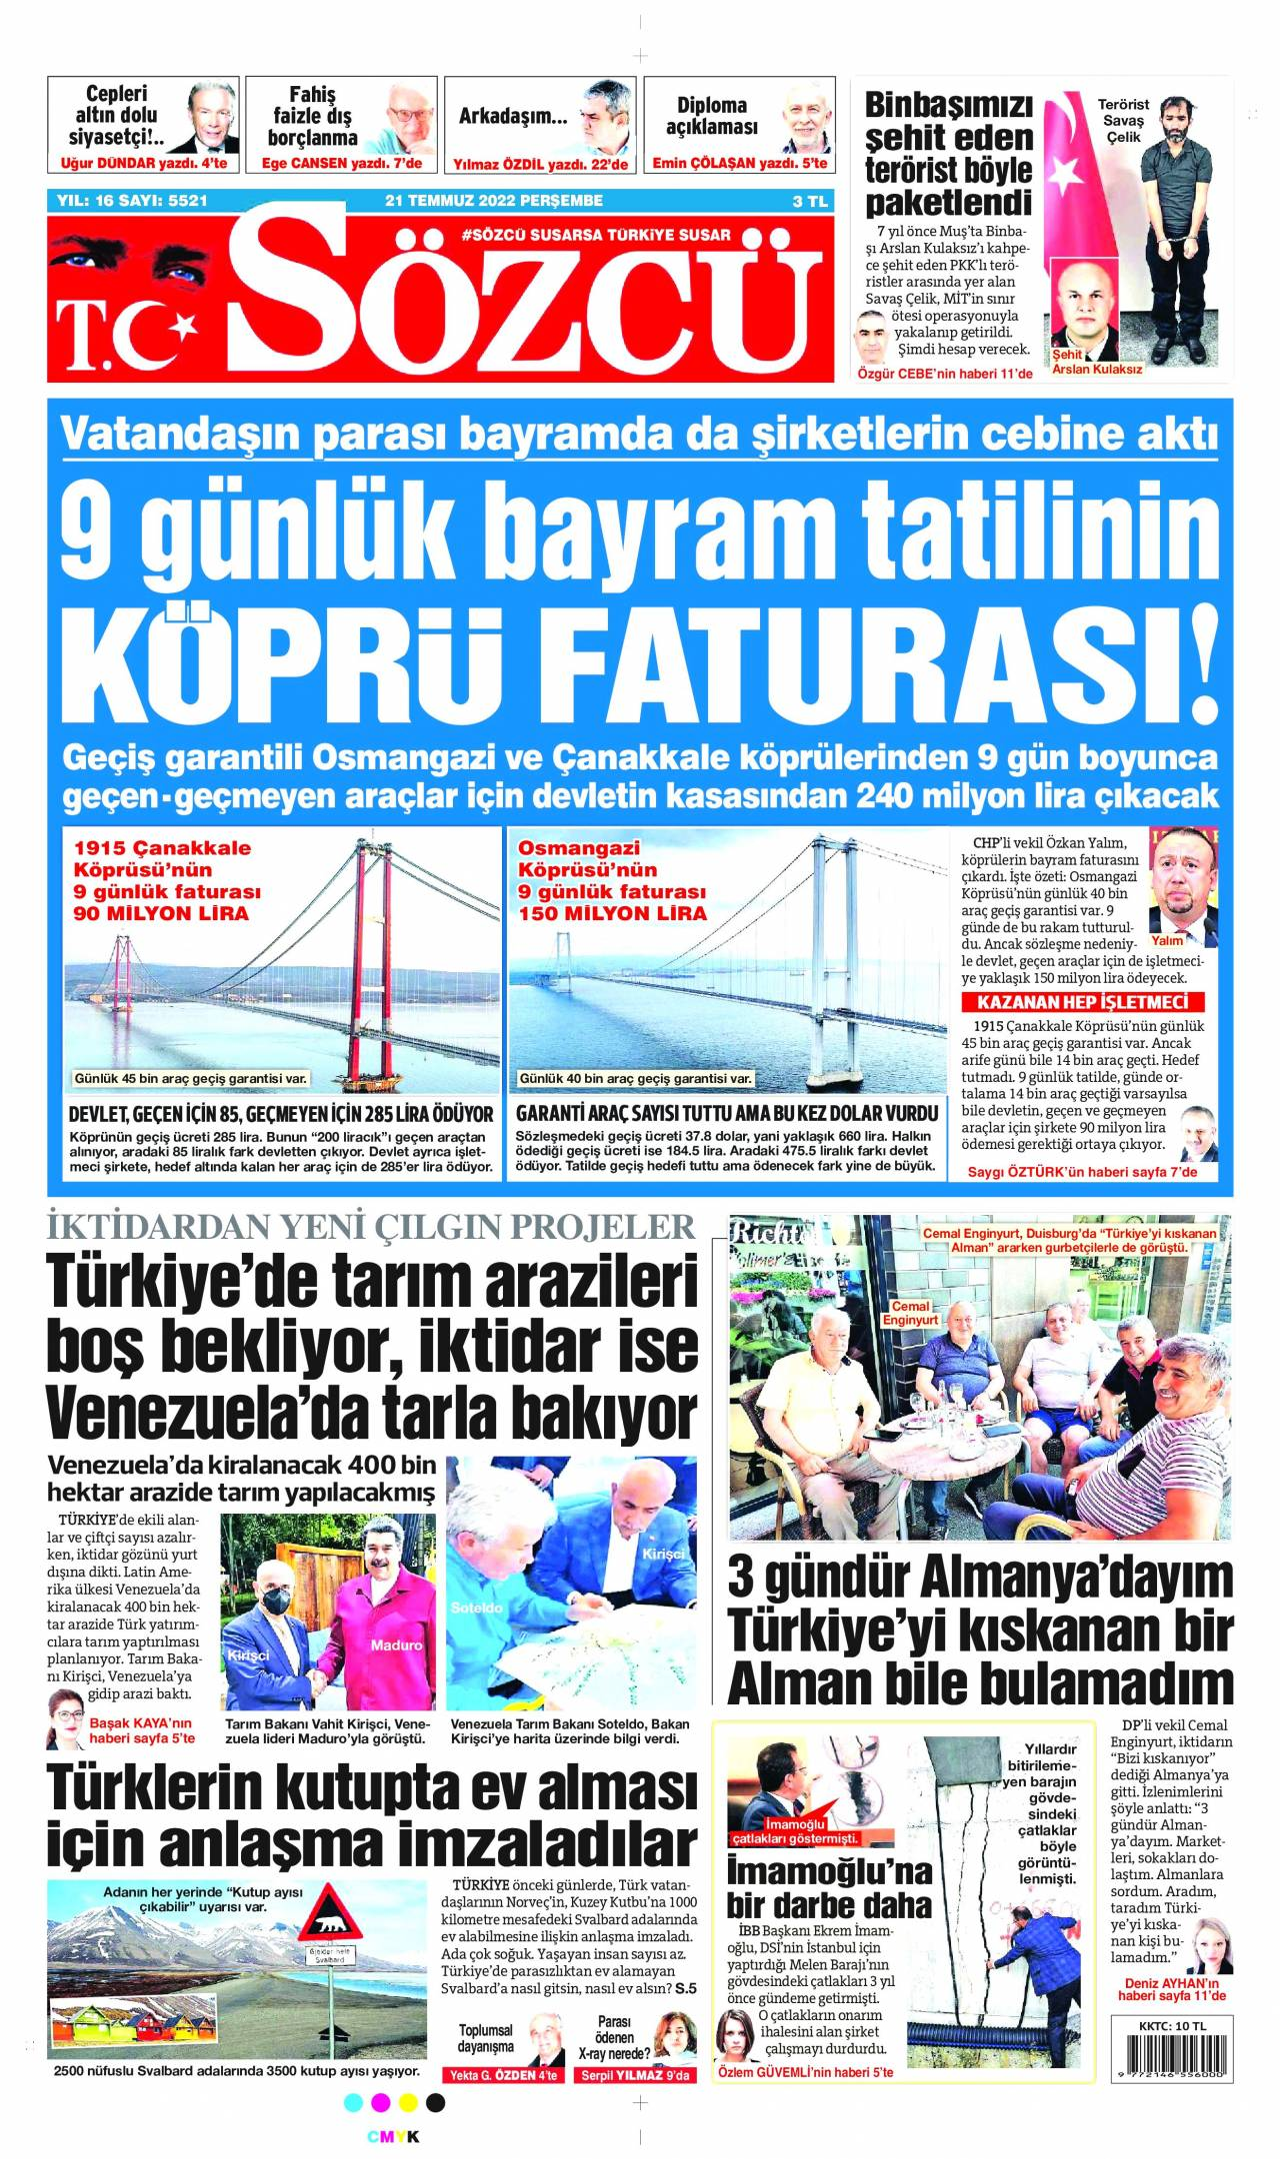 1 Haziran 2020, Pazartesi sozcu Gazetesi